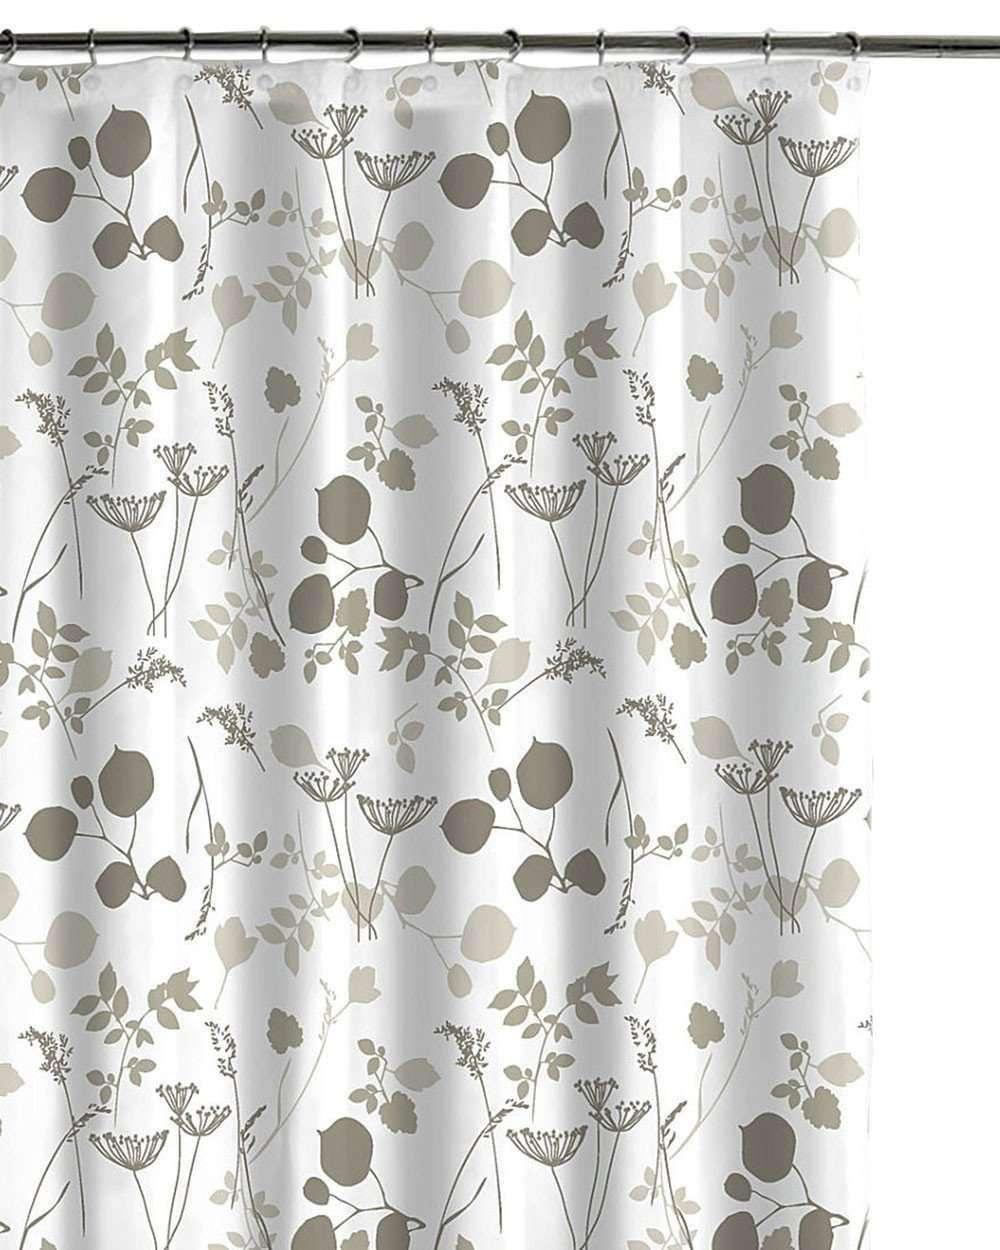 Luxor Linens Giardina Cotton Shower Curtain